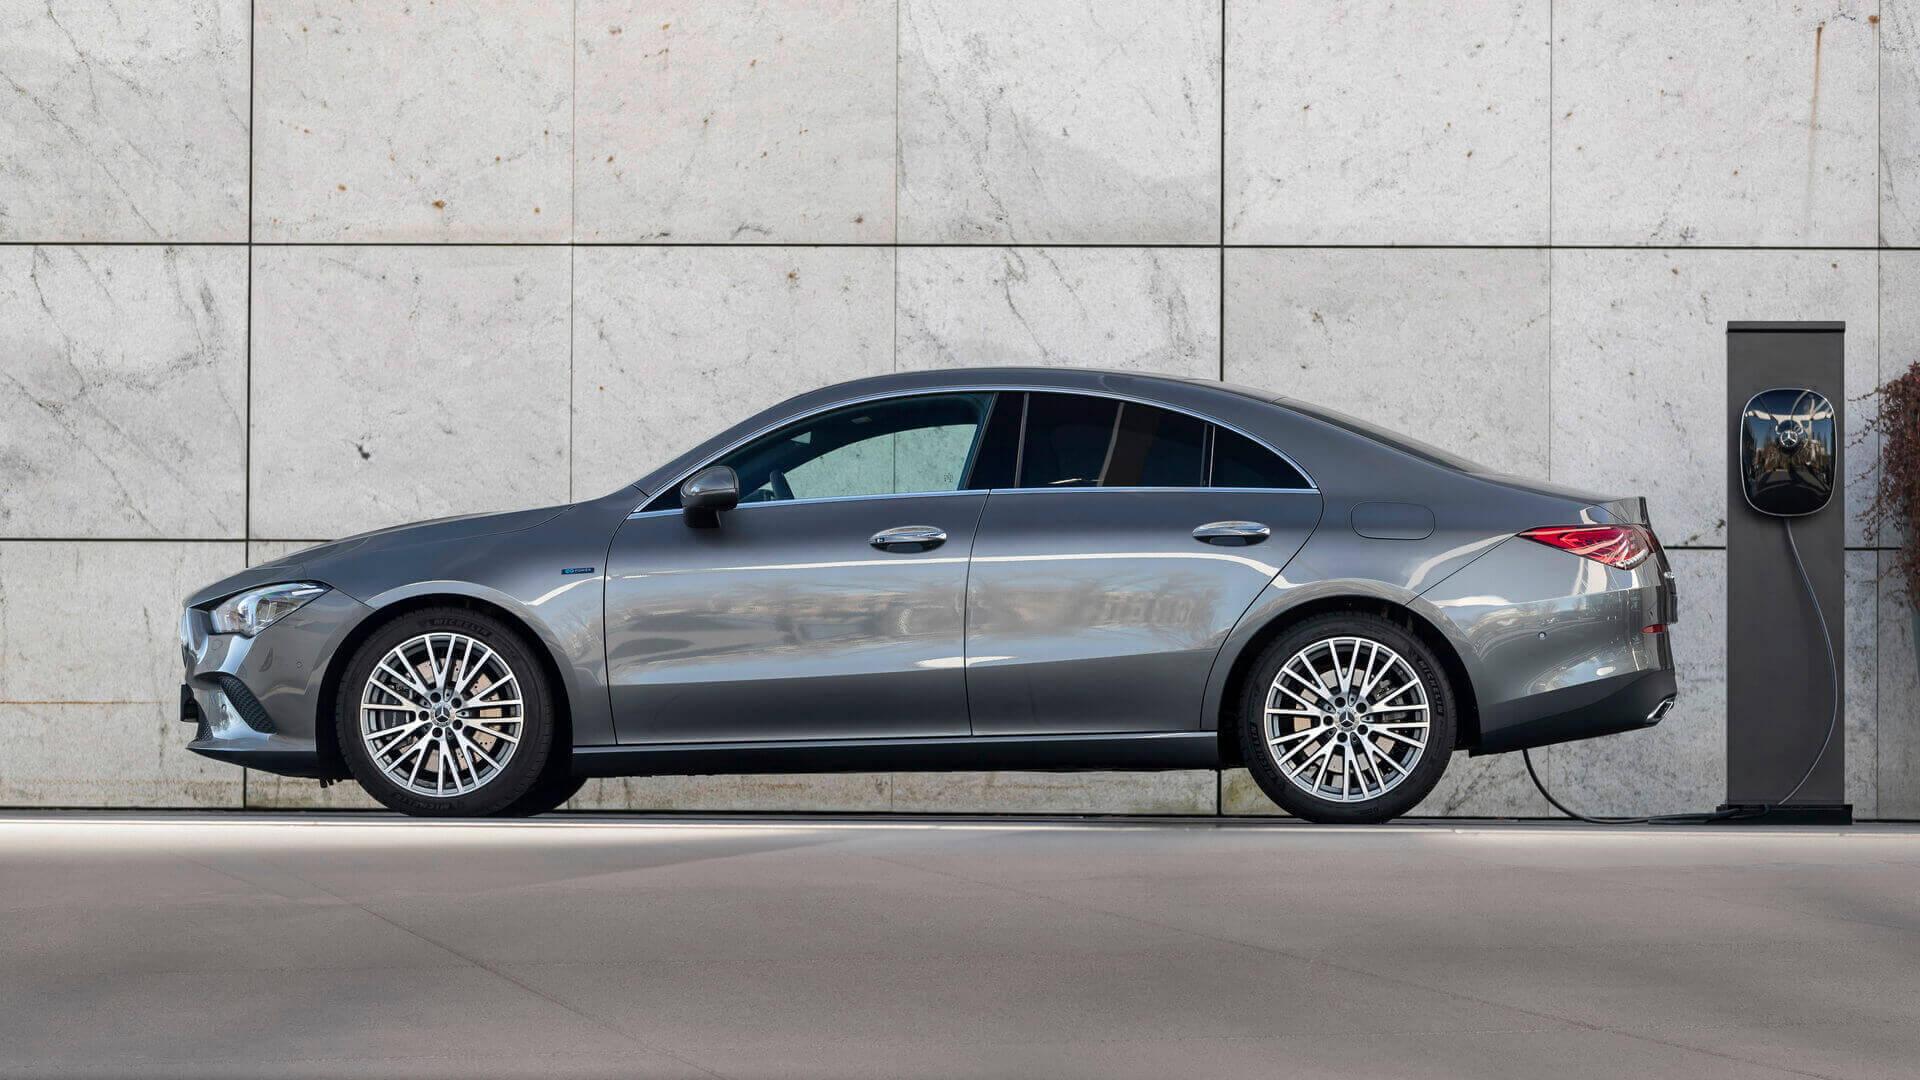 Плагин-гибрид Mercedes-Benz CLA 250 e Coupé